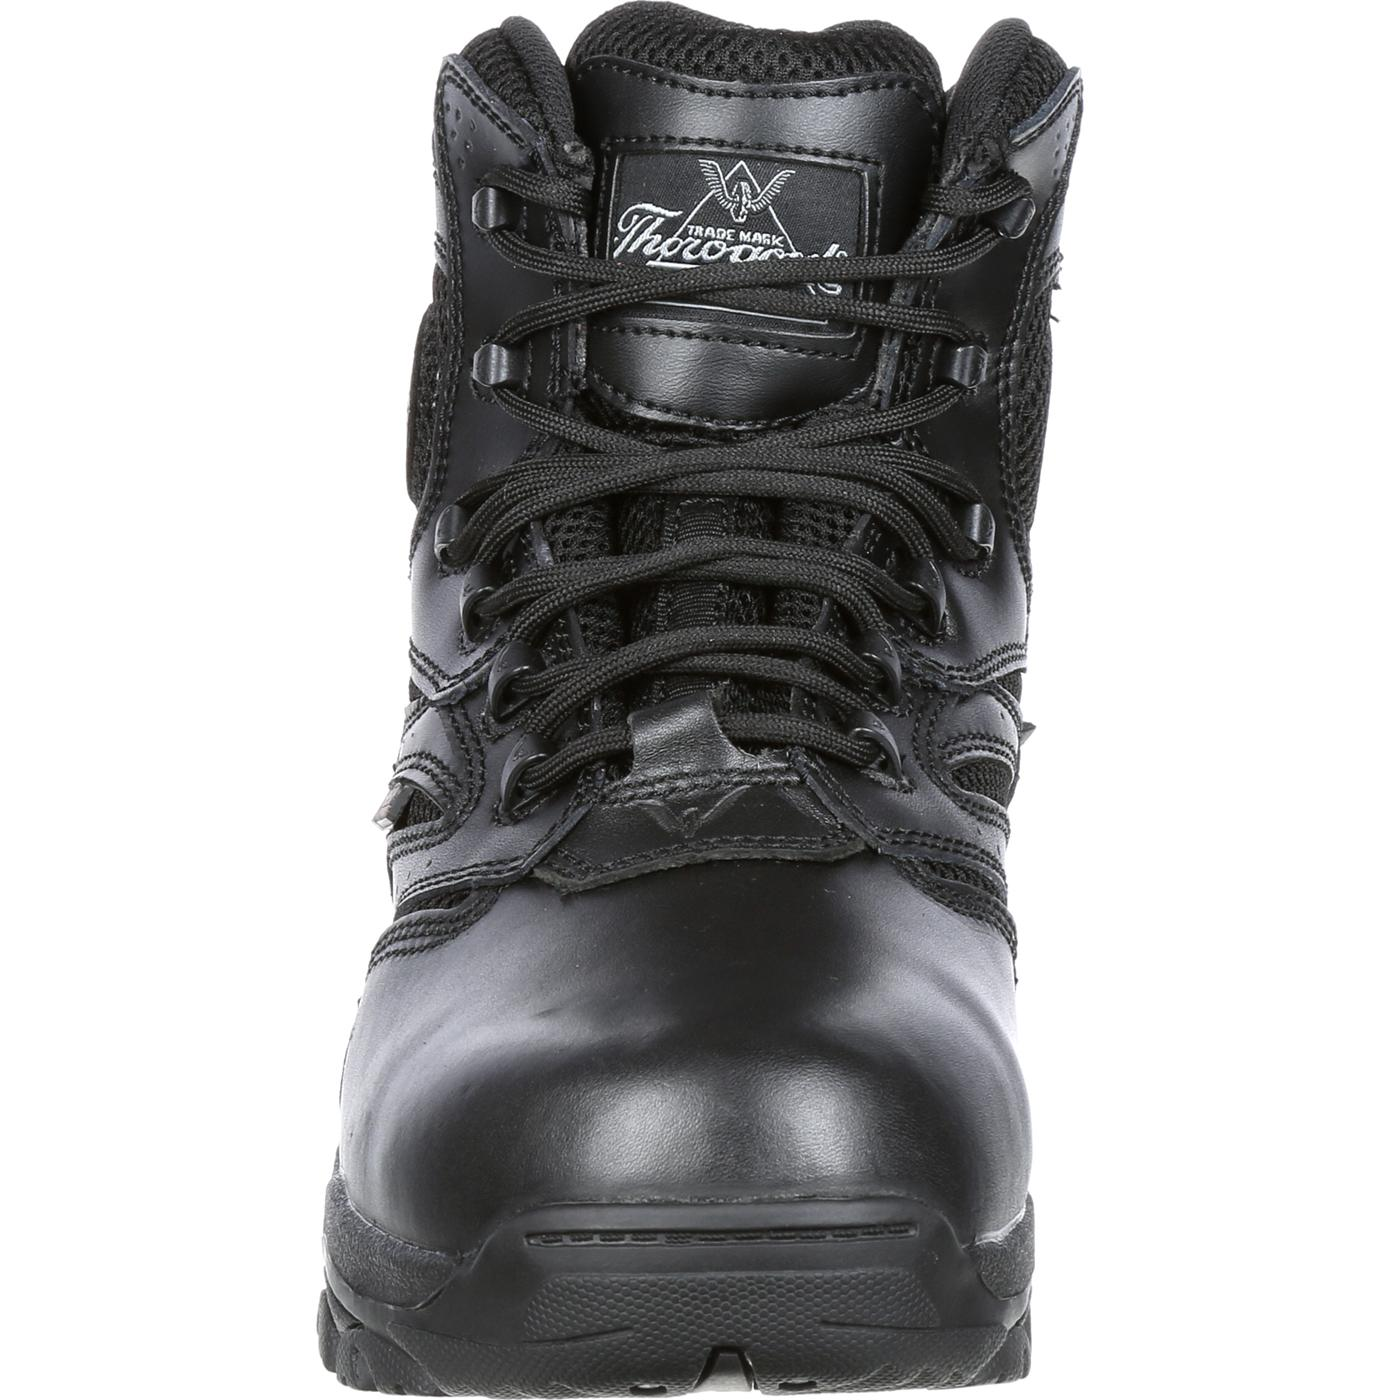 064583d7728 Thorogood The Deuce Composite Toe Waterproof Side-Zip Uniform Boot